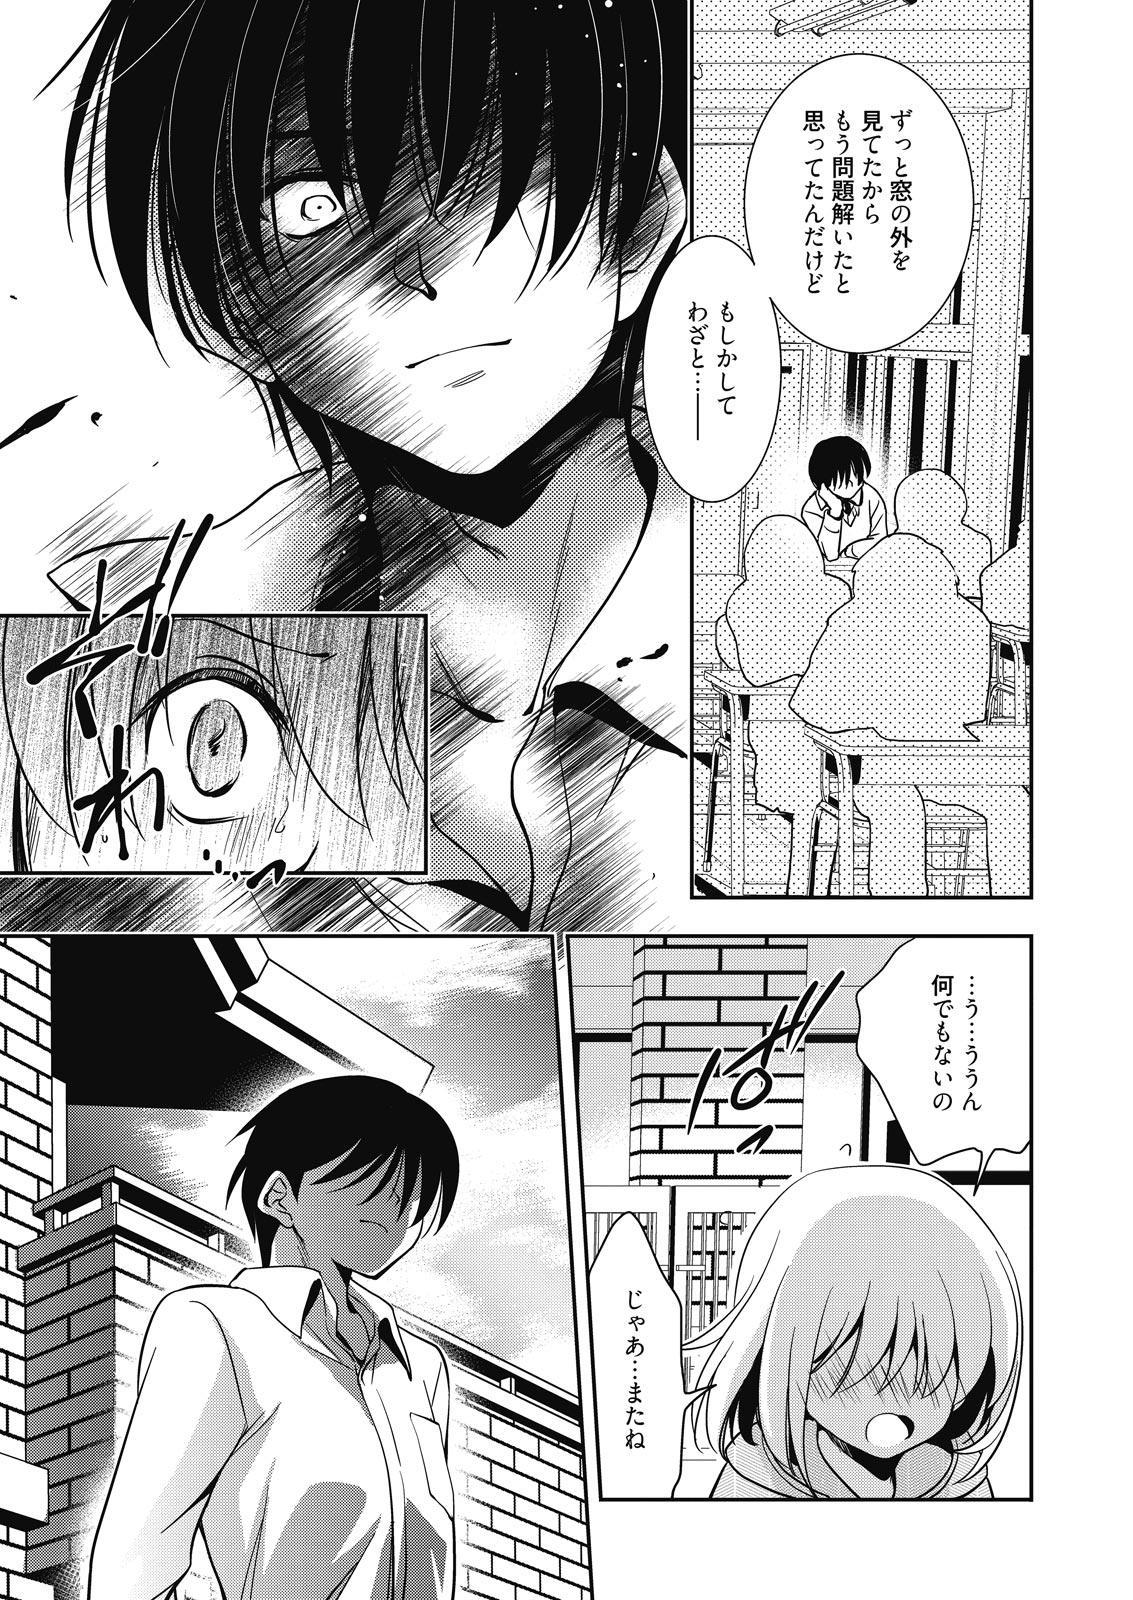 Web Manga Bangaichi Vol. 7 16